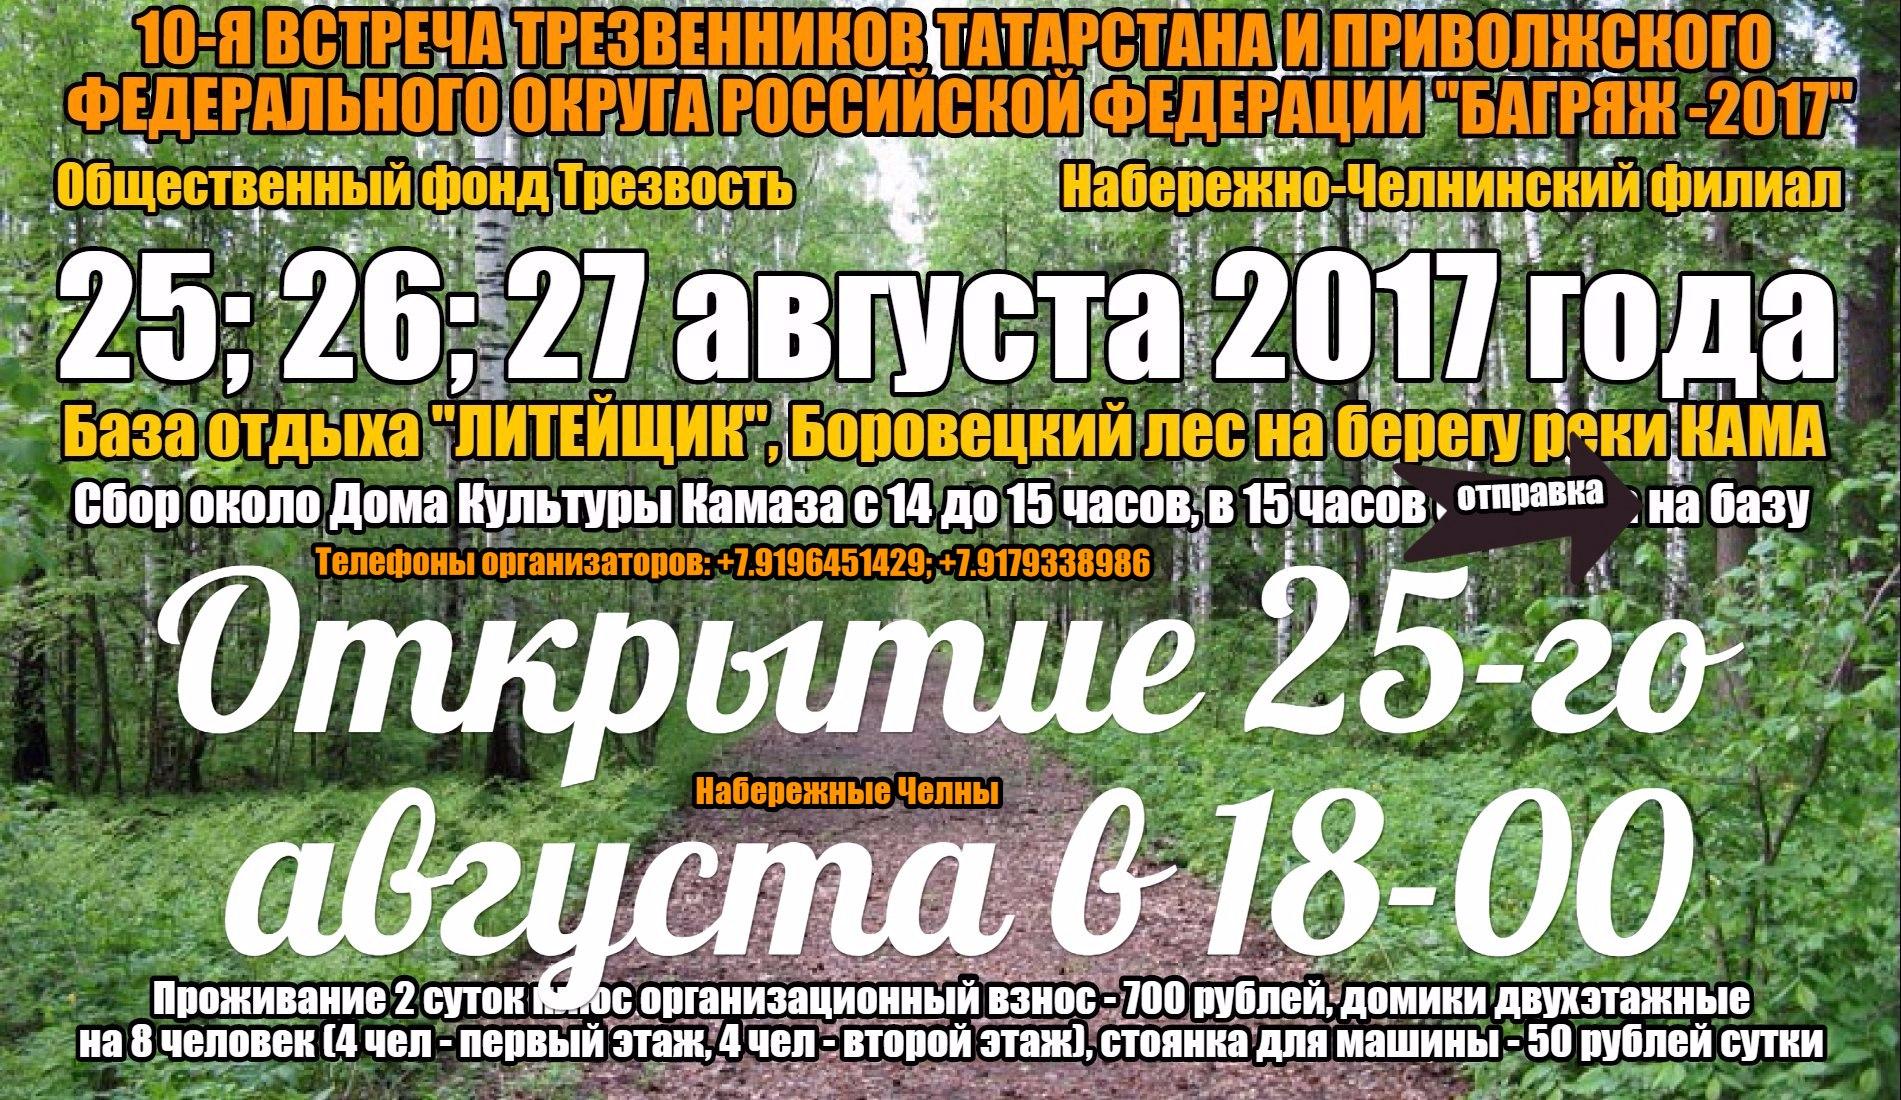 Tatarstan2017